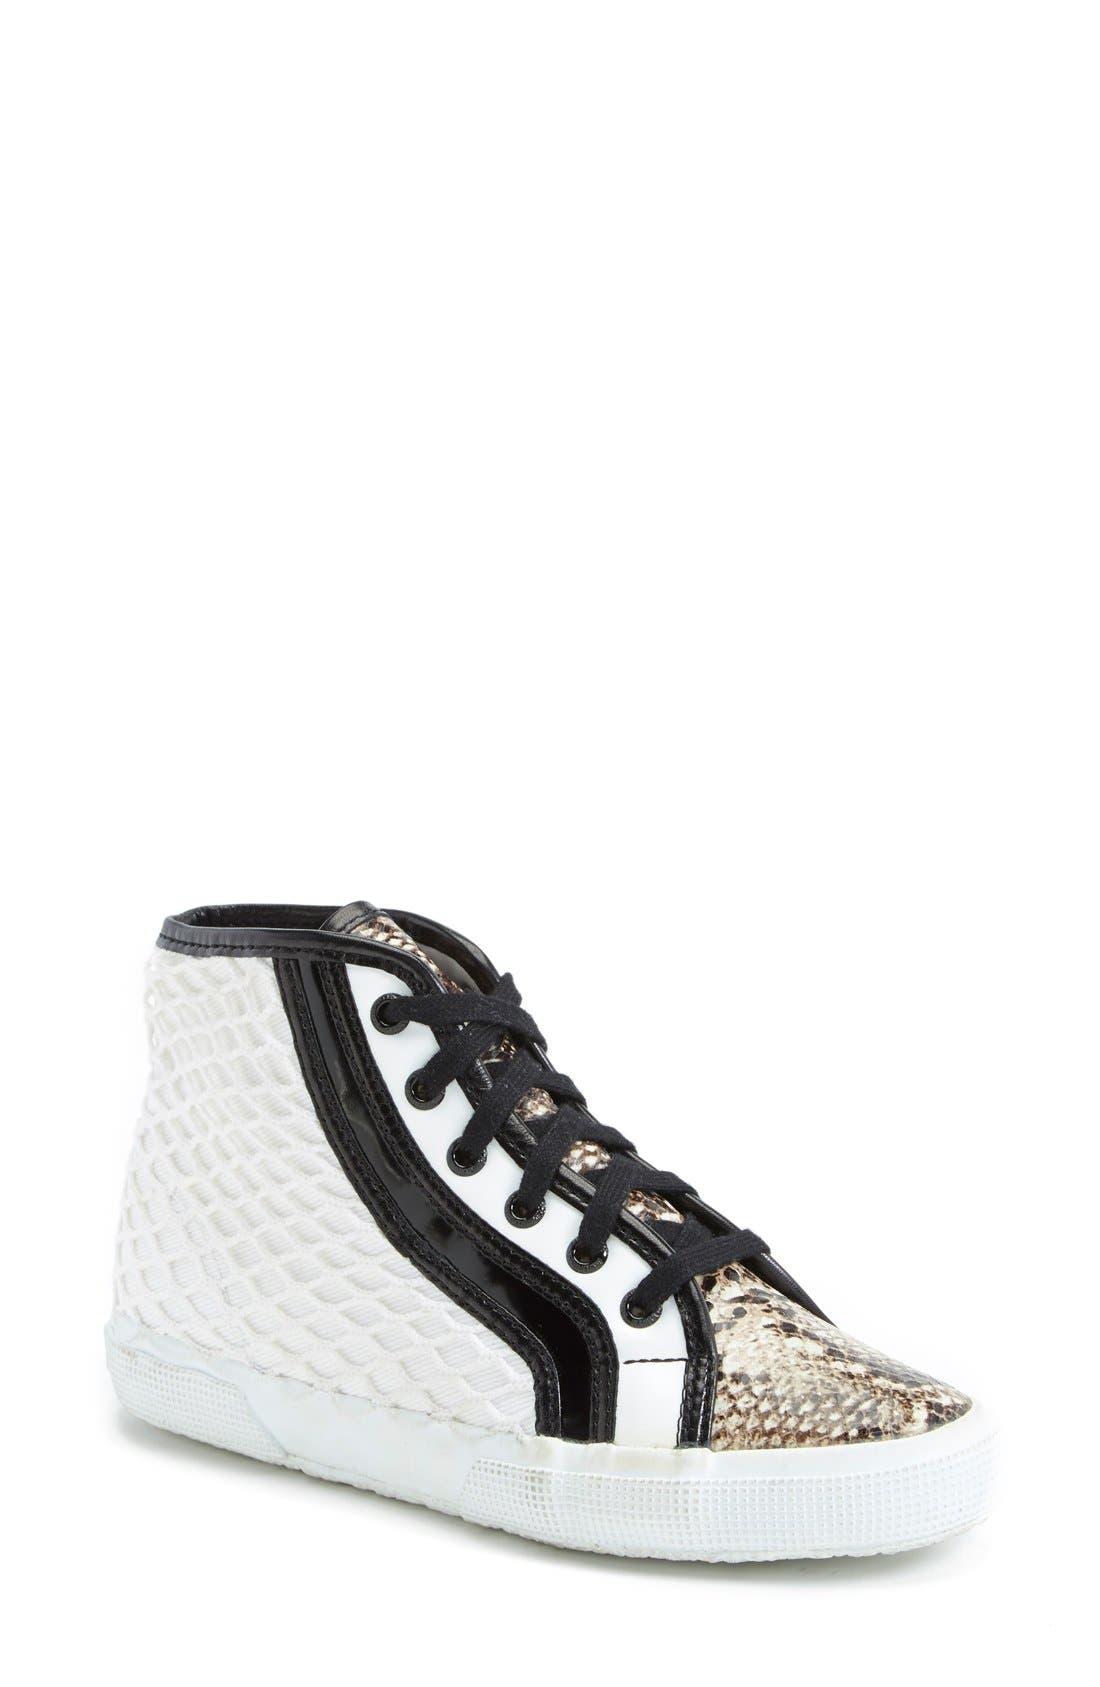 Alternate Image 1 Selected - Superga Rodarte Mixed Media High Top Sneaker (Women)